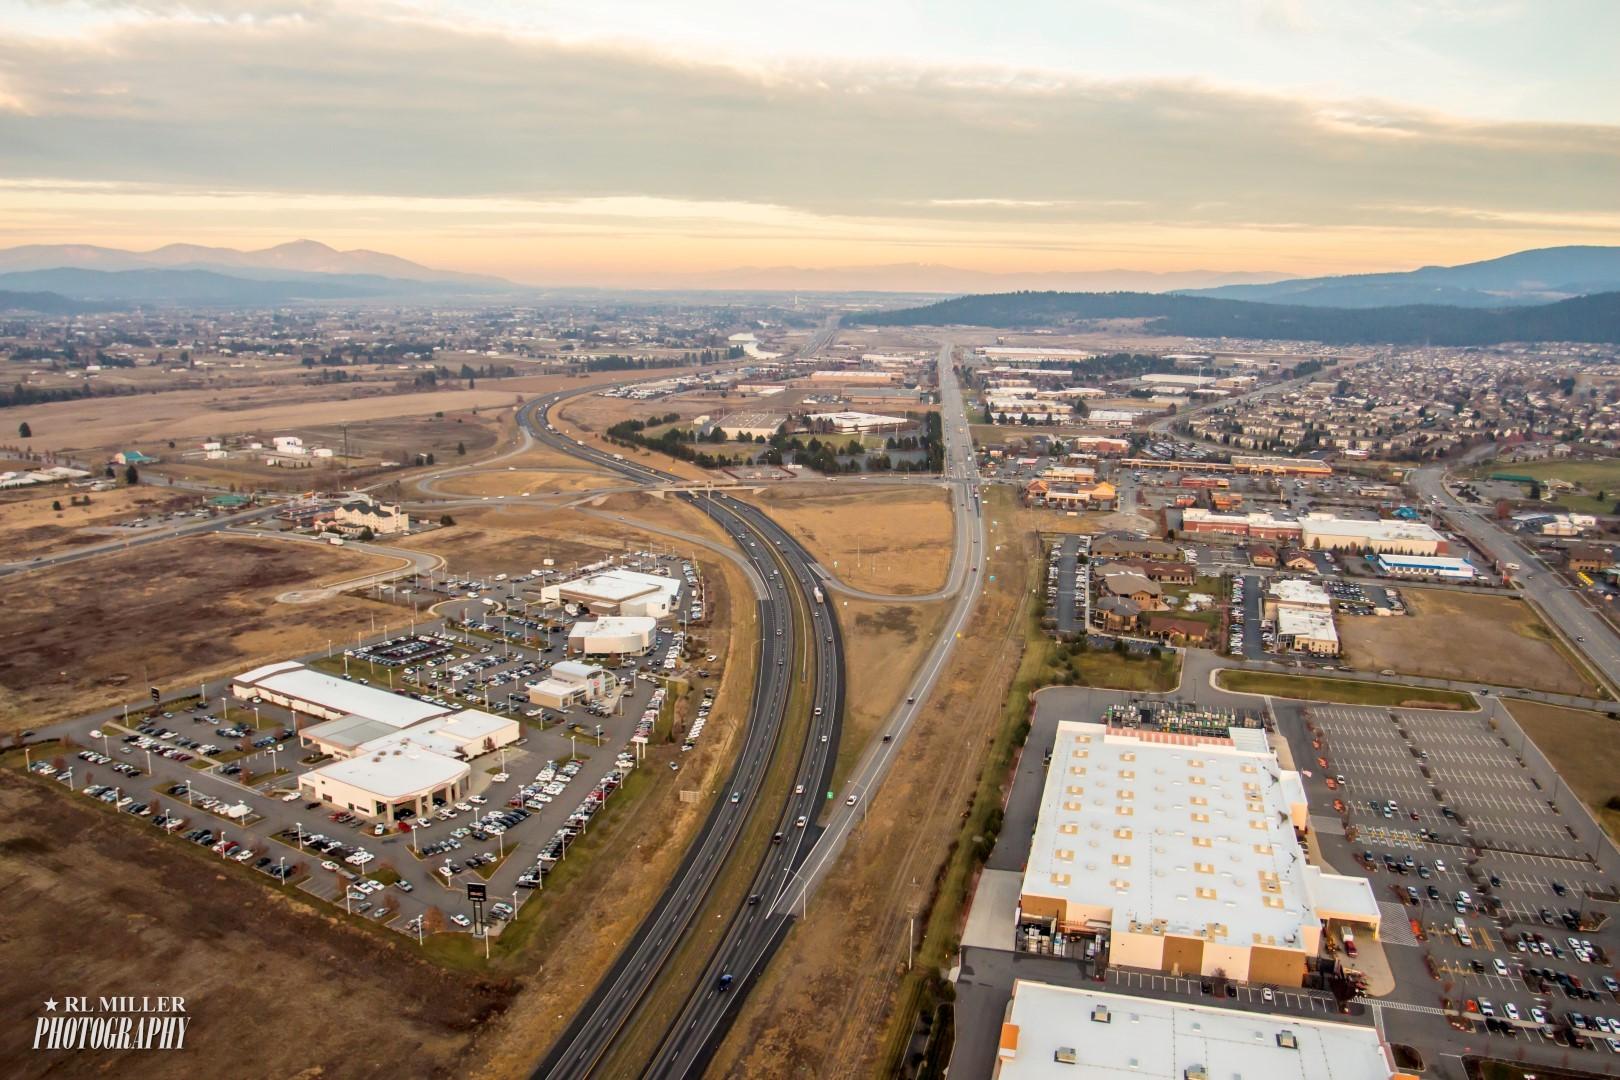 Rl Miller Photography Spokane Aerial Photography Rl